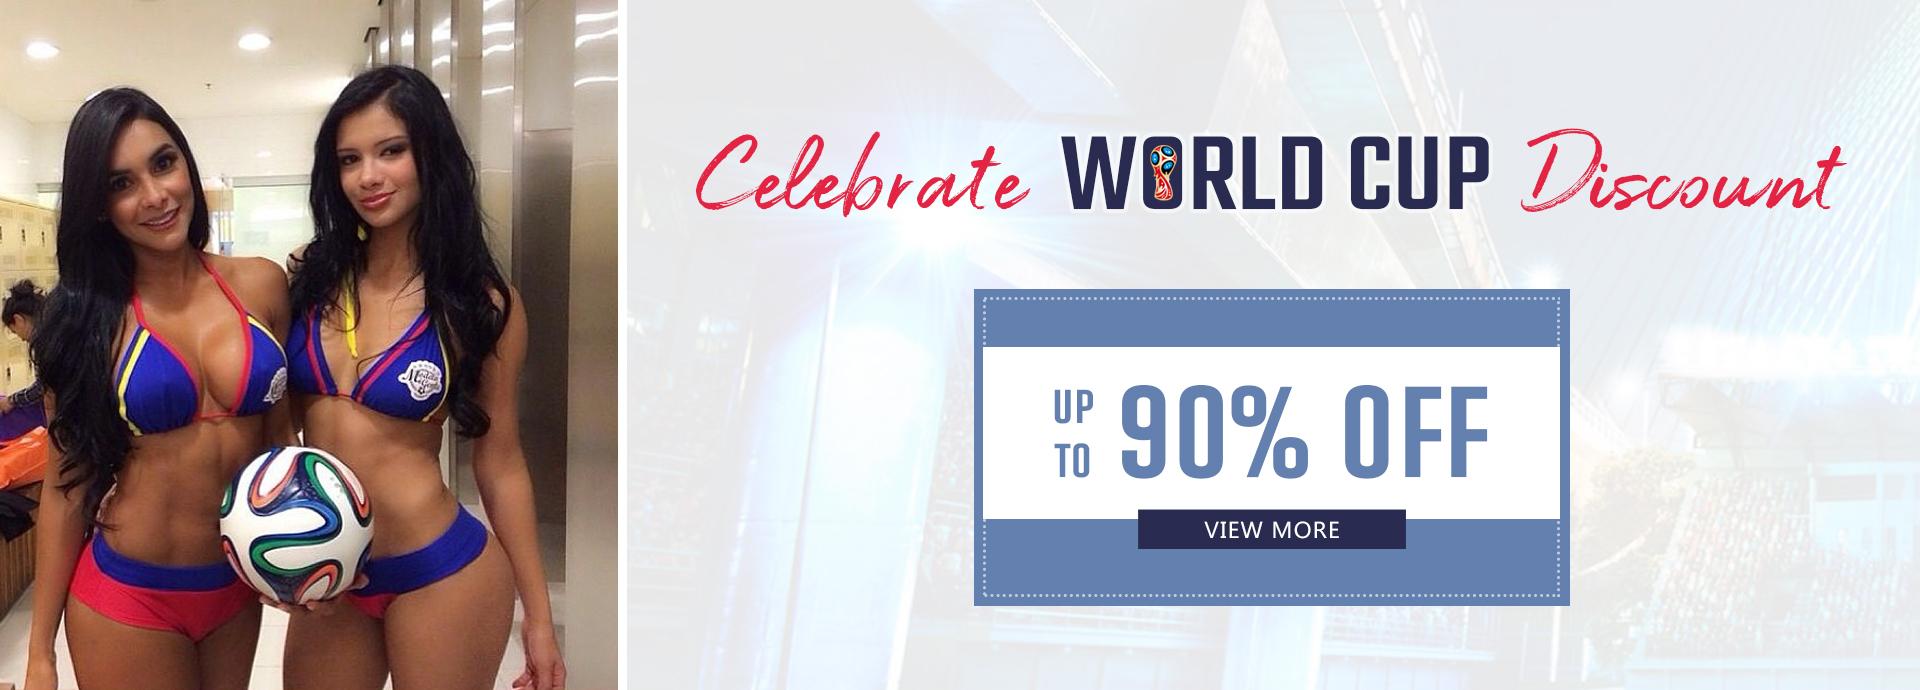 Celebrate World Cup Discount